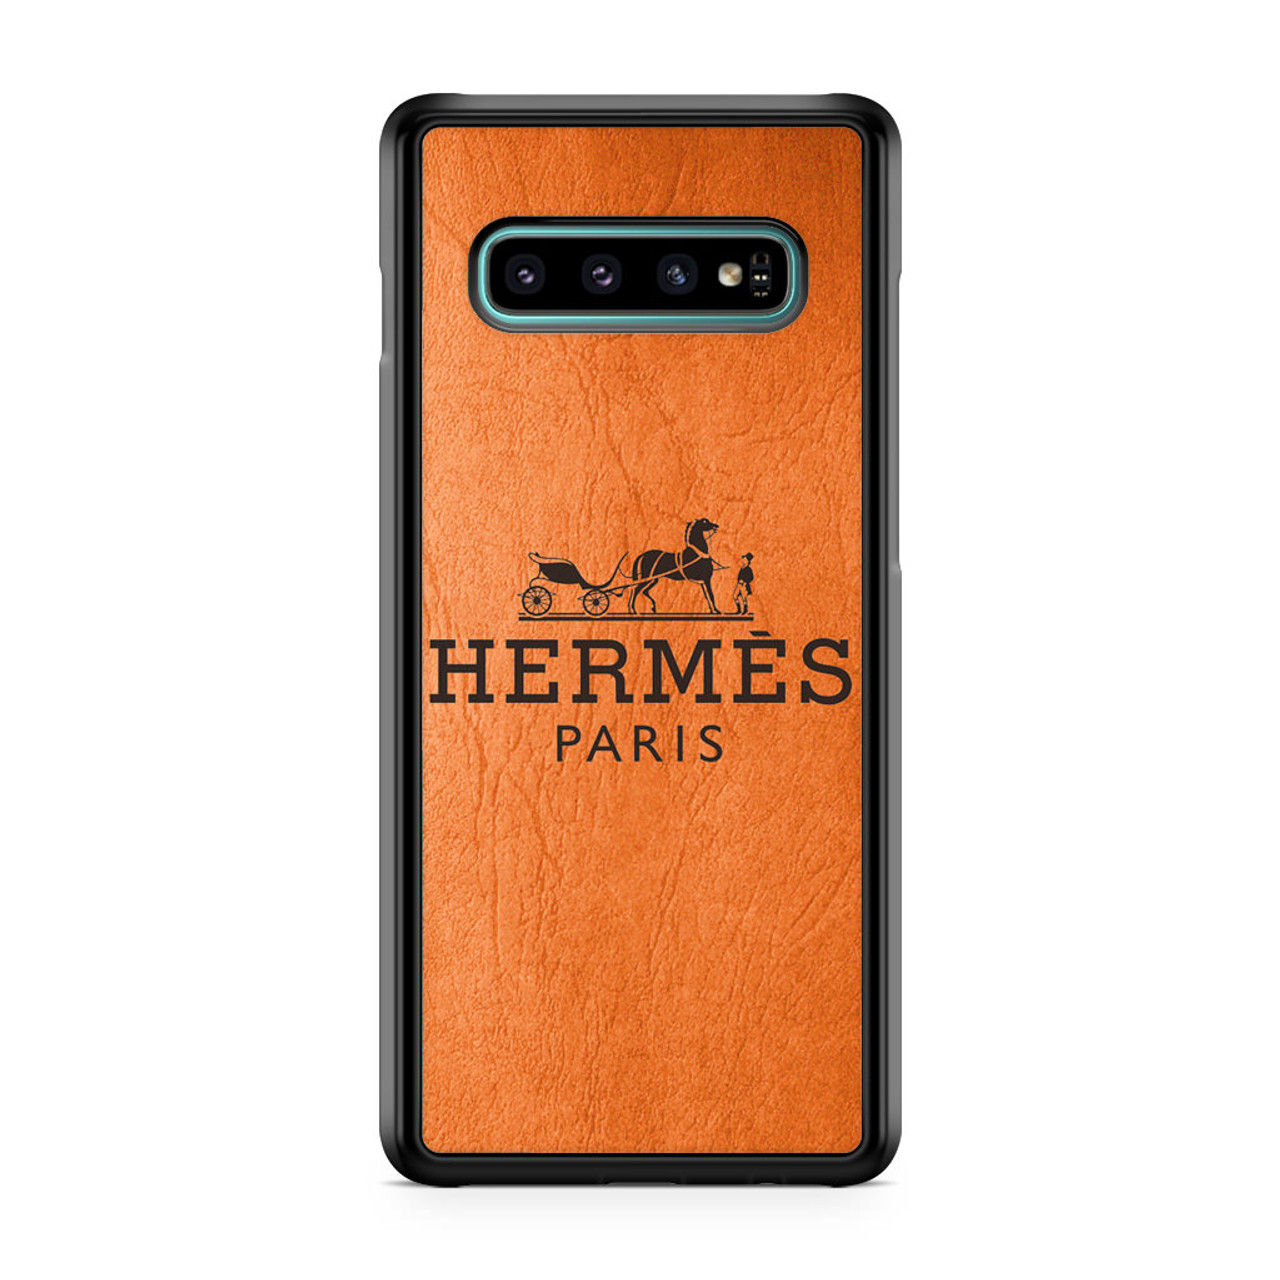 stable quality amazon official images Hermes Paris Samsung Galaxy S10 Plus Case